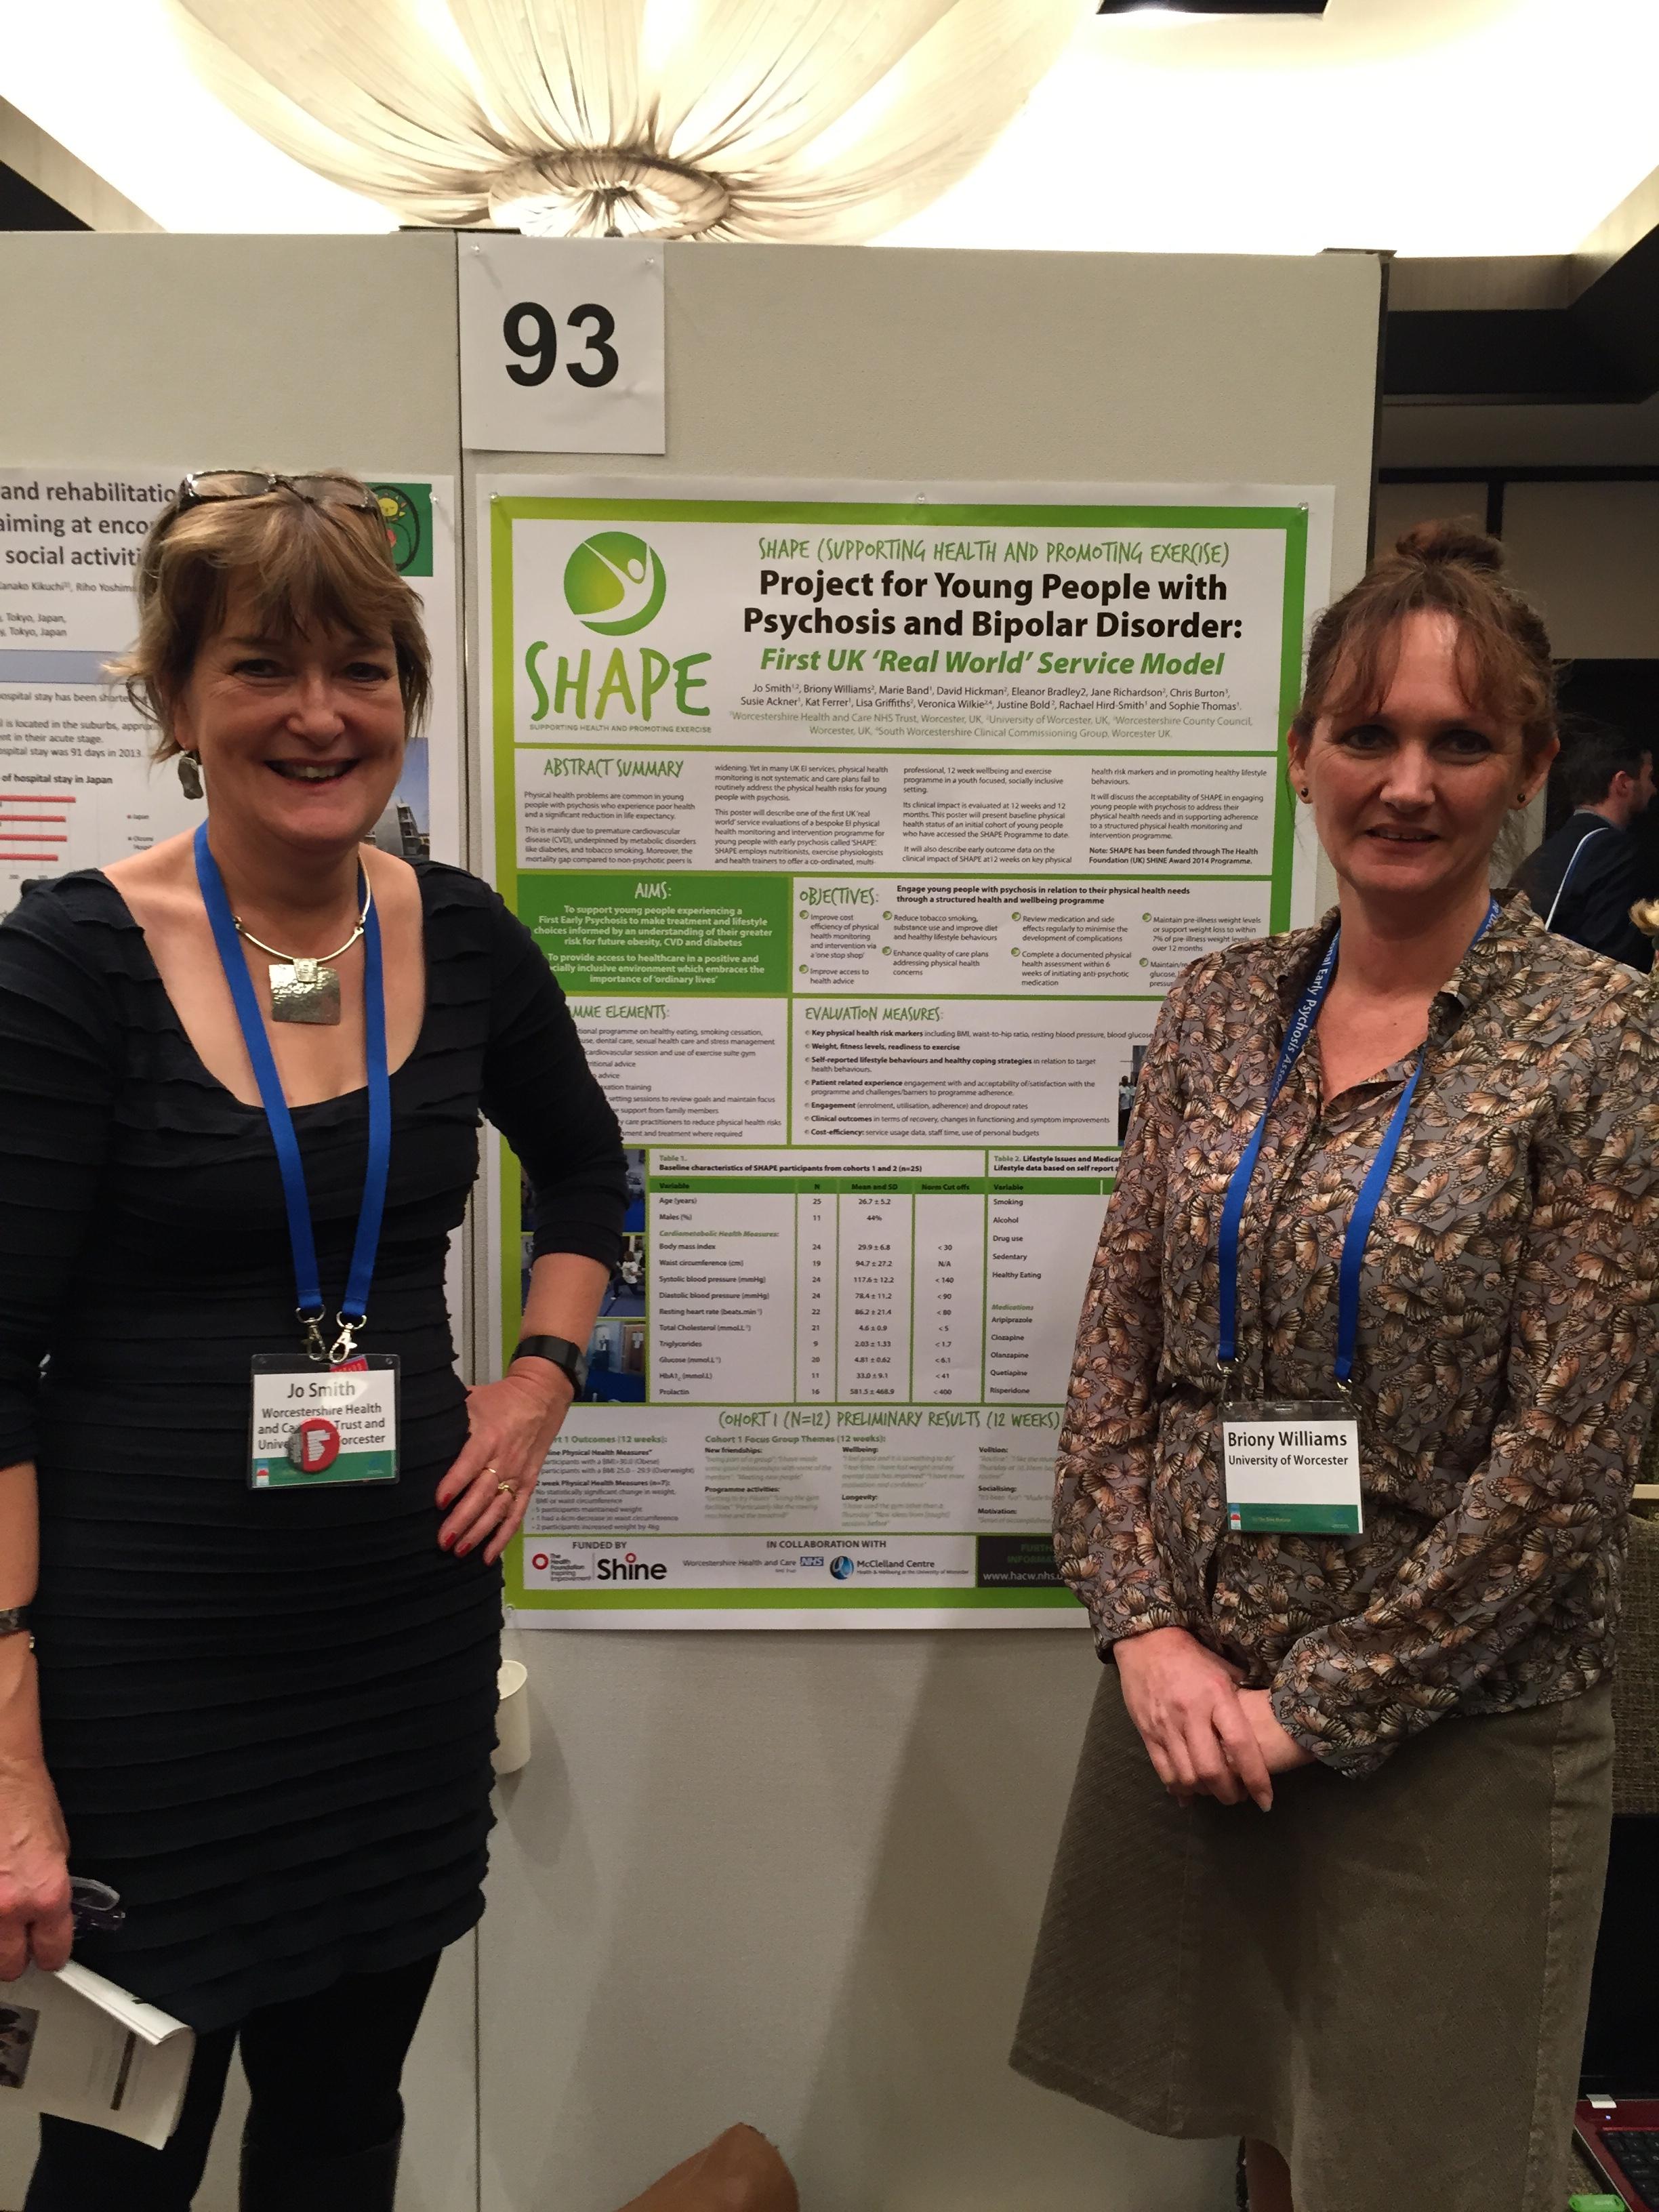 SHAPE program, UK presented at IEPA